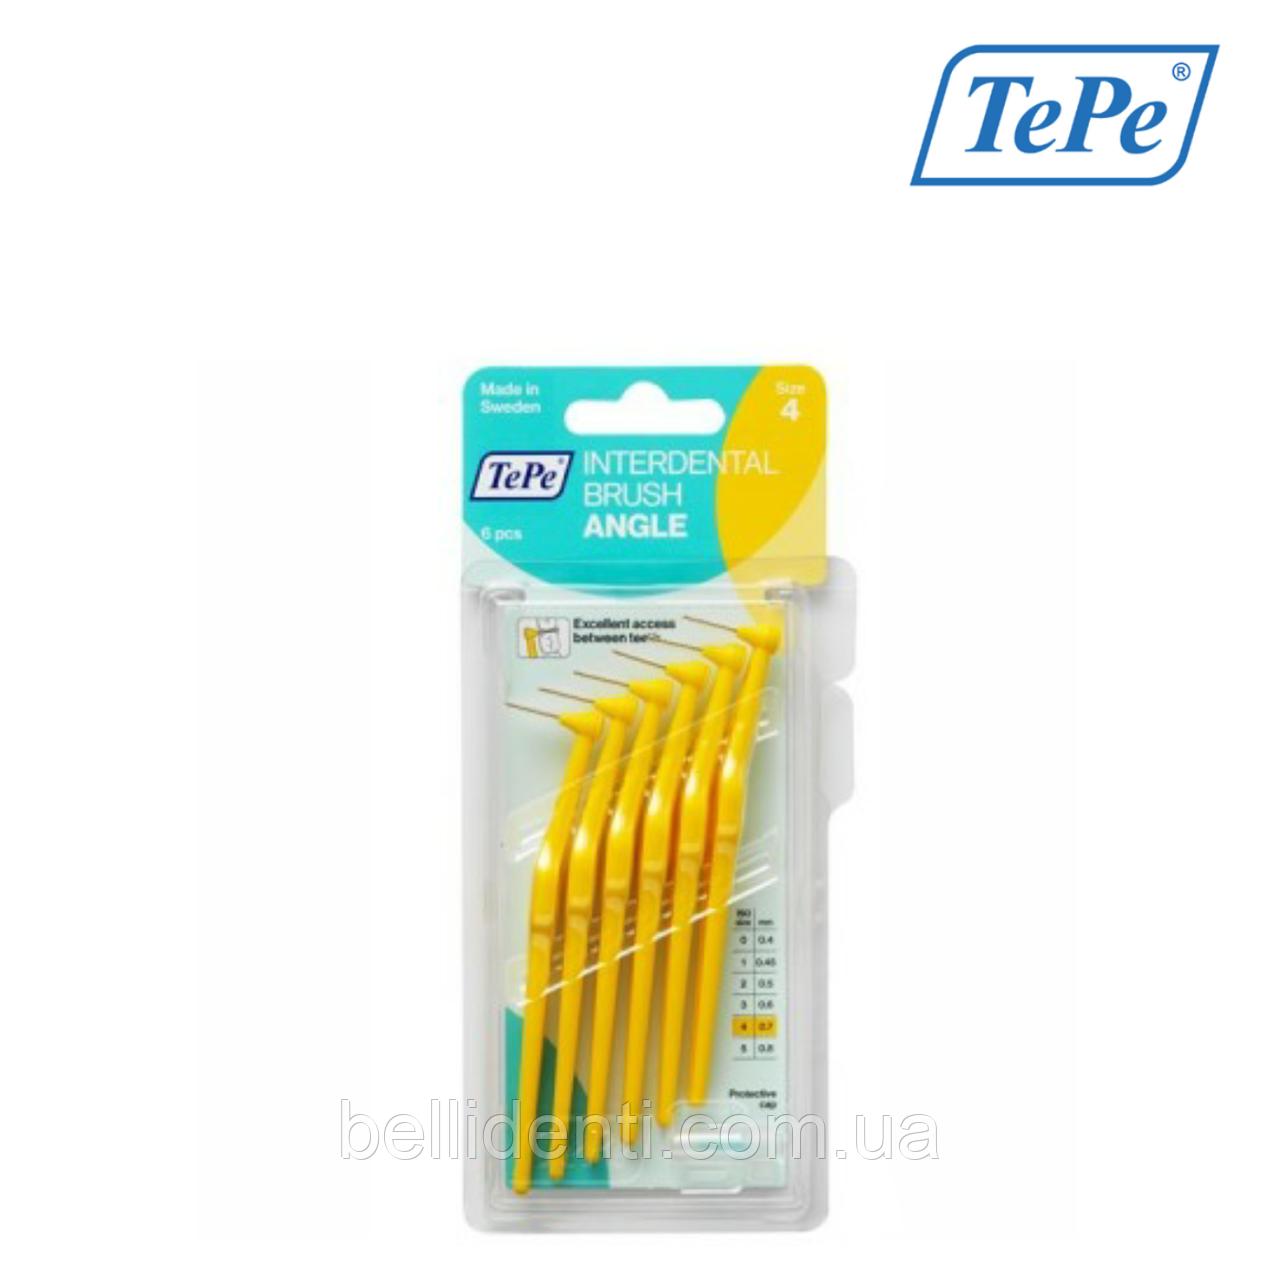 Межзубная щетка TePe Angle угловая, желтый (0,7 мм), 6 шт